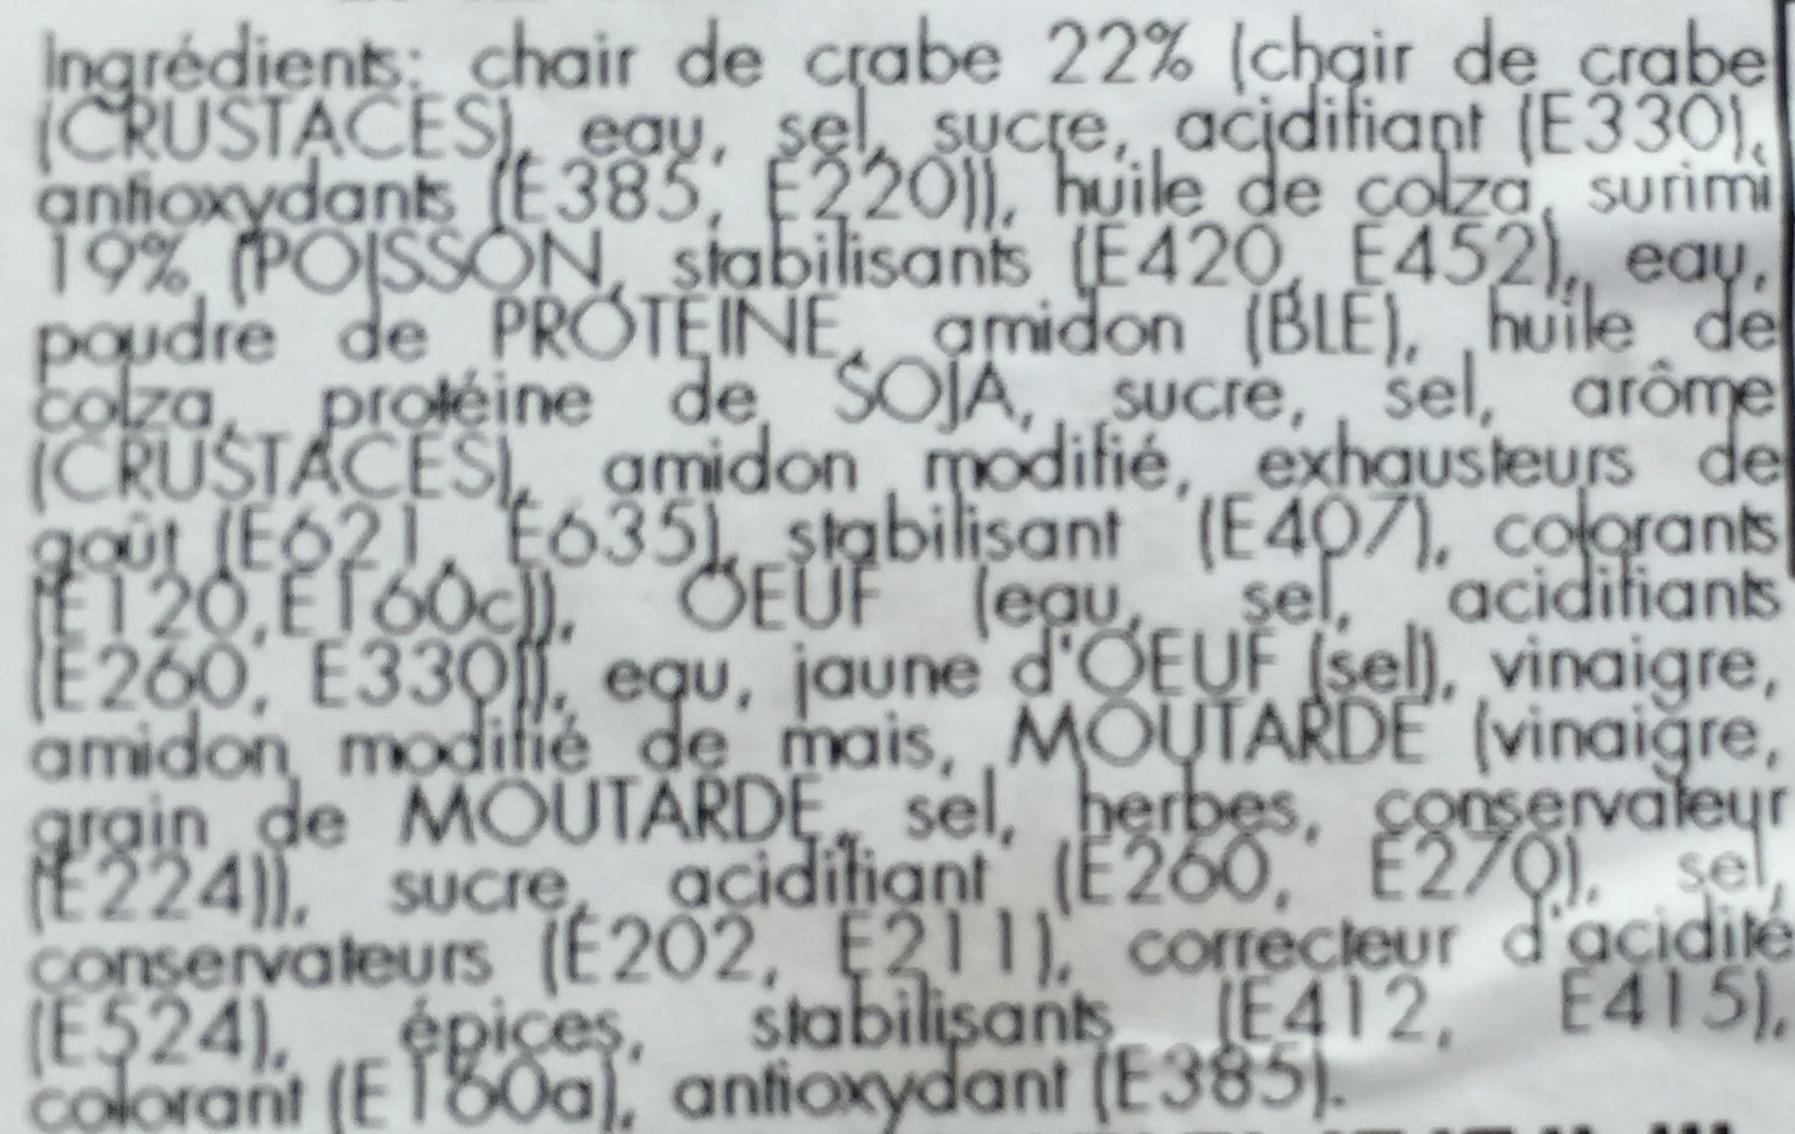 Salade au Crabe-Surimi - Ingrédients - fr